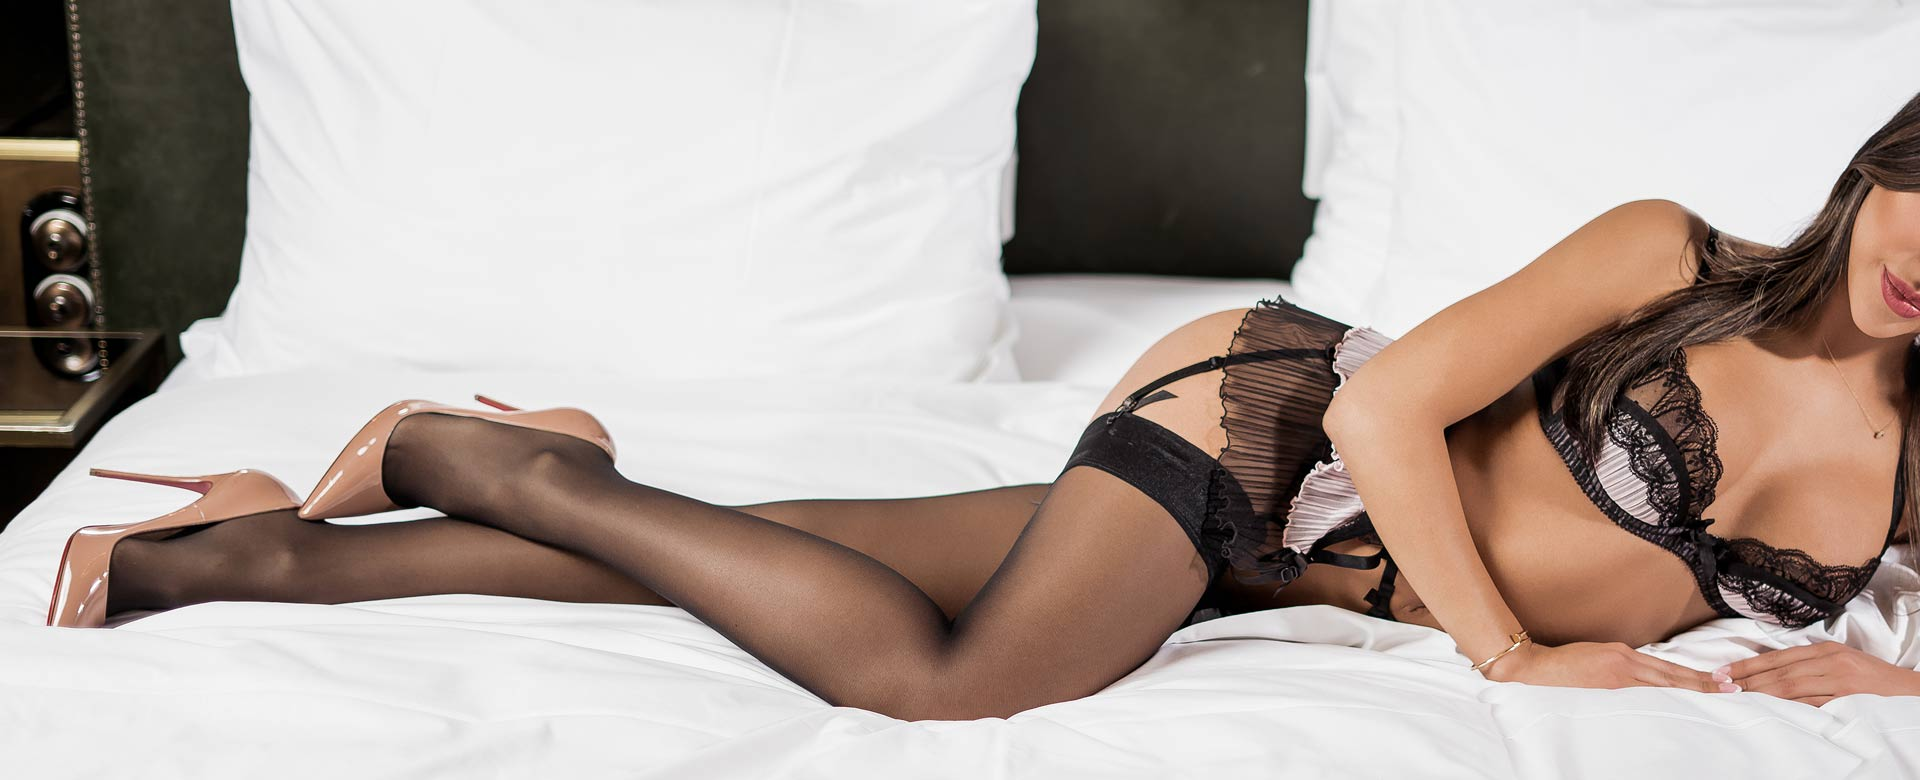 Saphira, une escorte bisexuelle